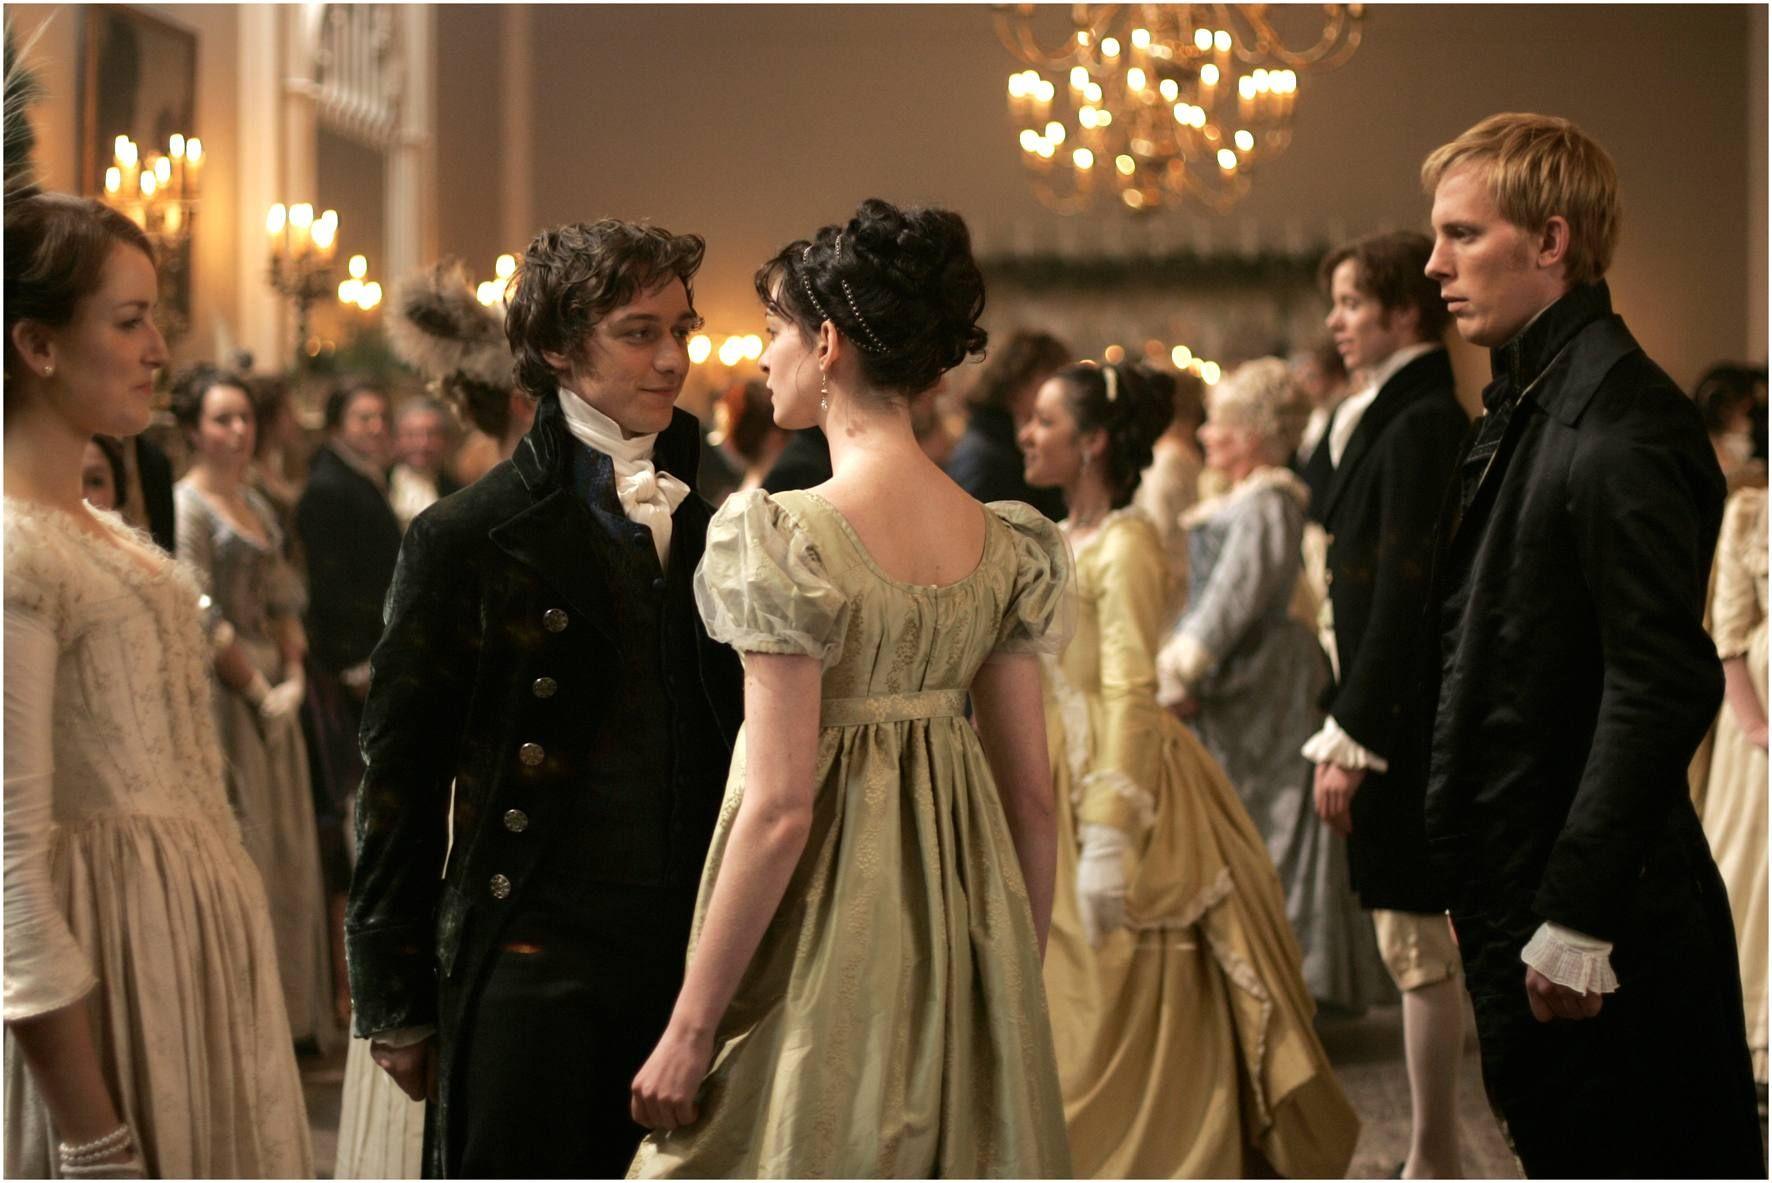 The dress code regency georgian era and regency era for Wedding dinner dress code